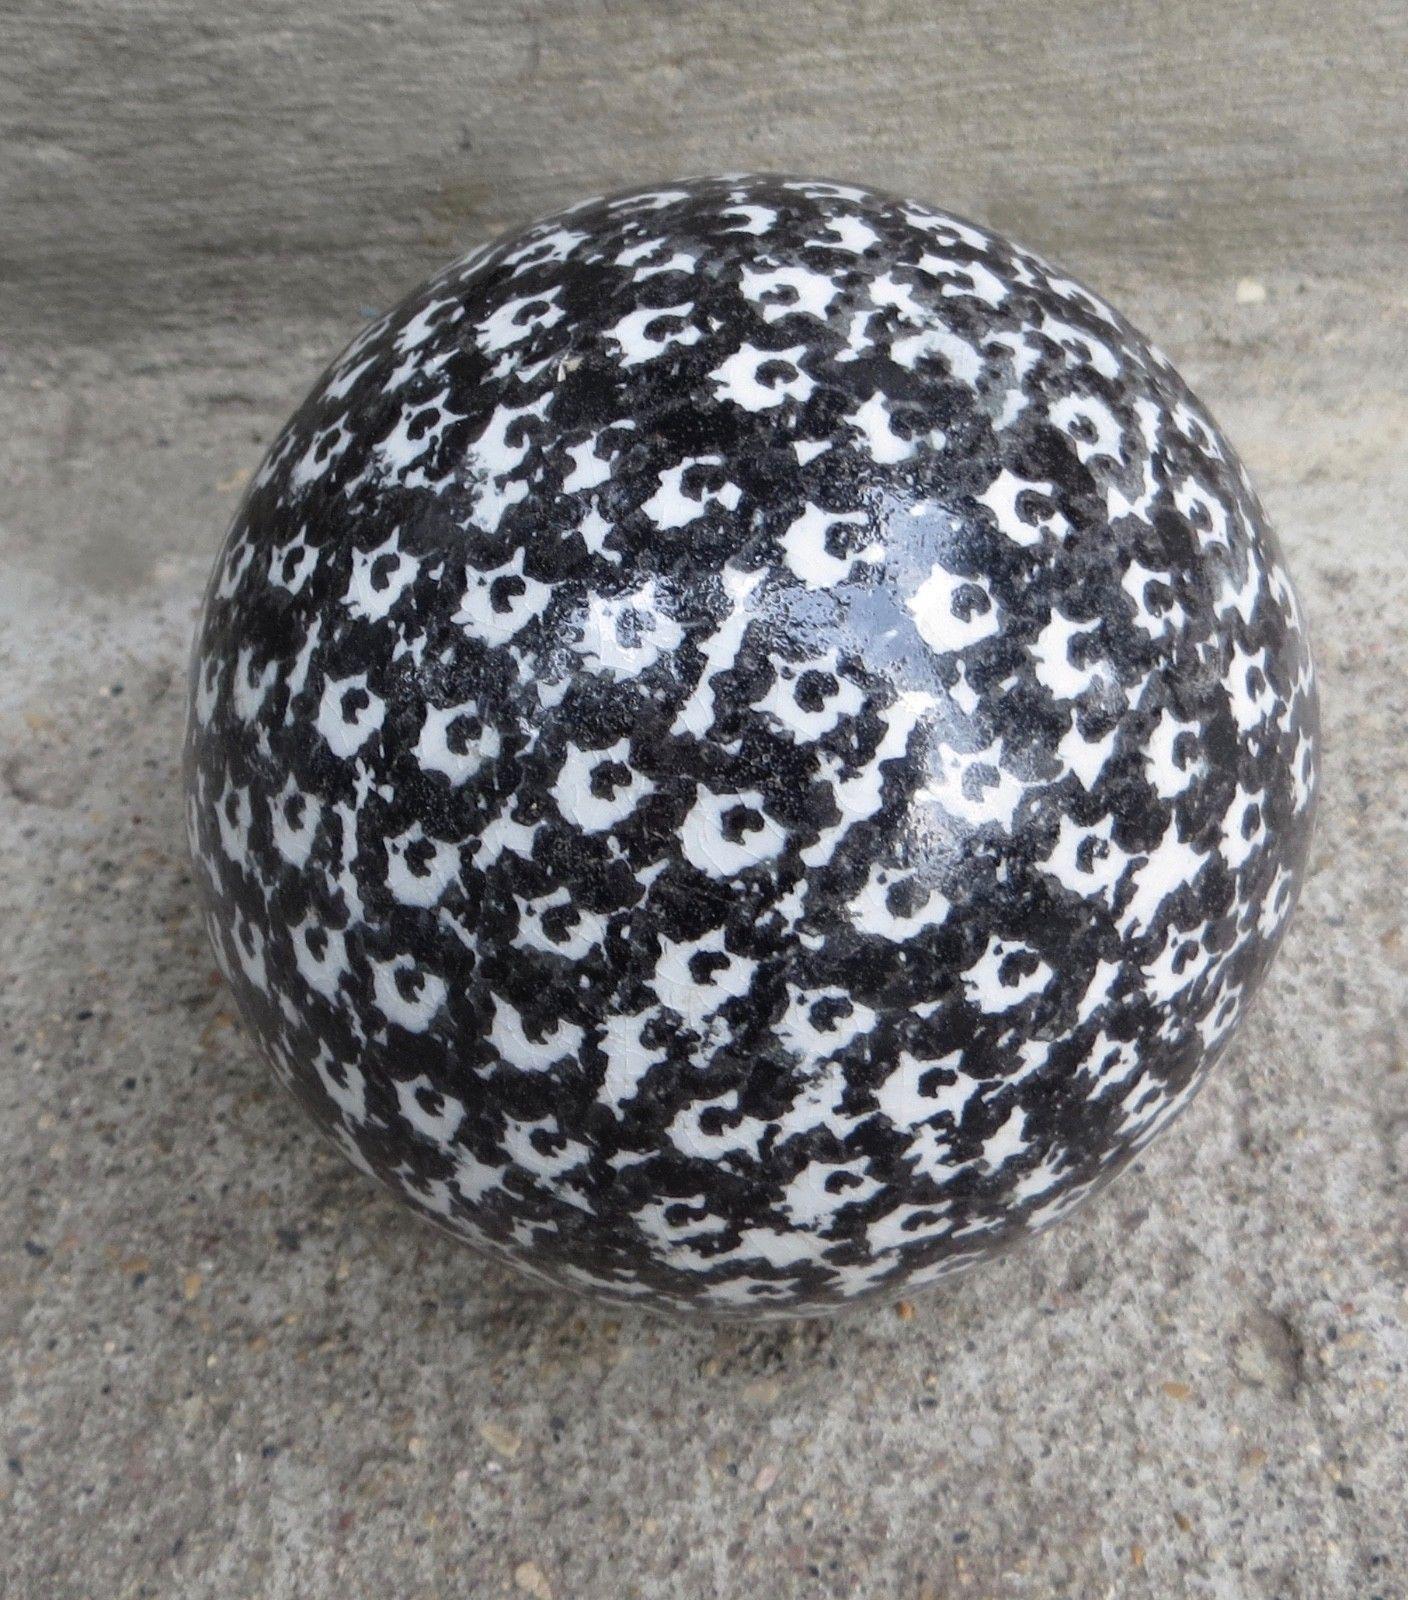 Antique Victorian Carpet Bowling Ball Black And White Sponge Design Splatter Carpet Bowls Bowling Ball Christmas Bulbs